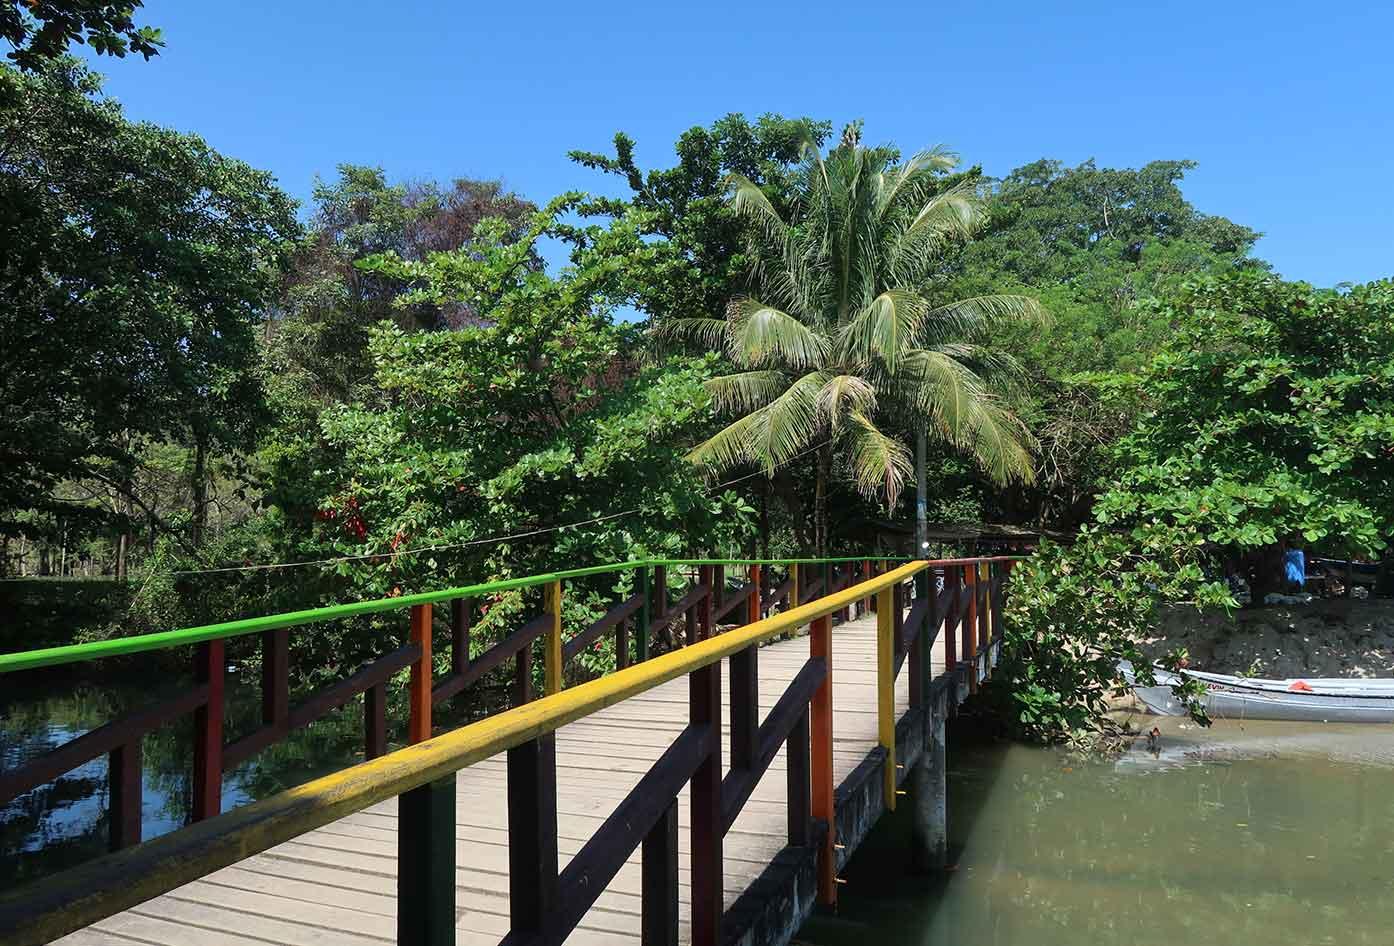 capurgana bridge